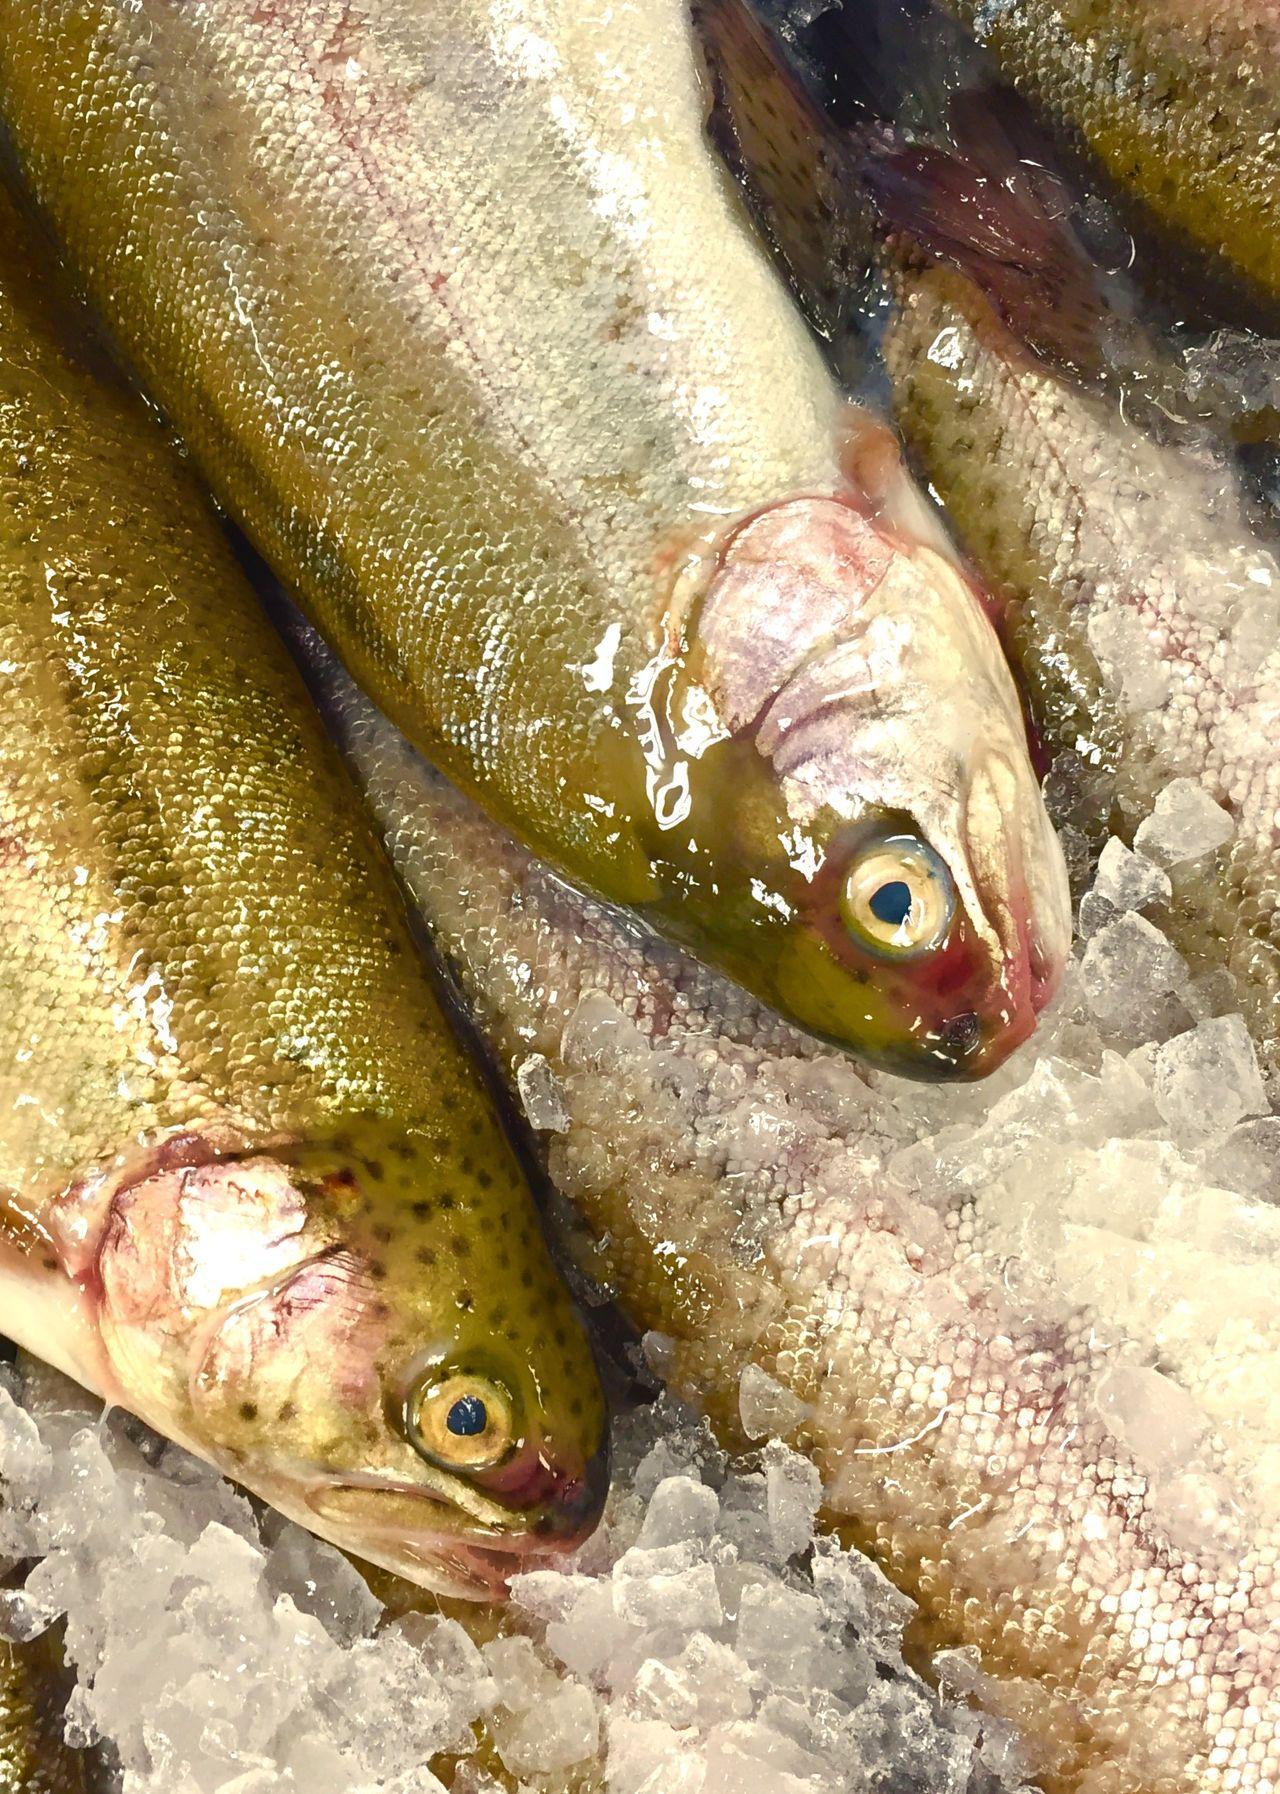 Fish Display DEAD FISH Supermarket Display Of Fish Fresh Trout Trout Fresh Fish